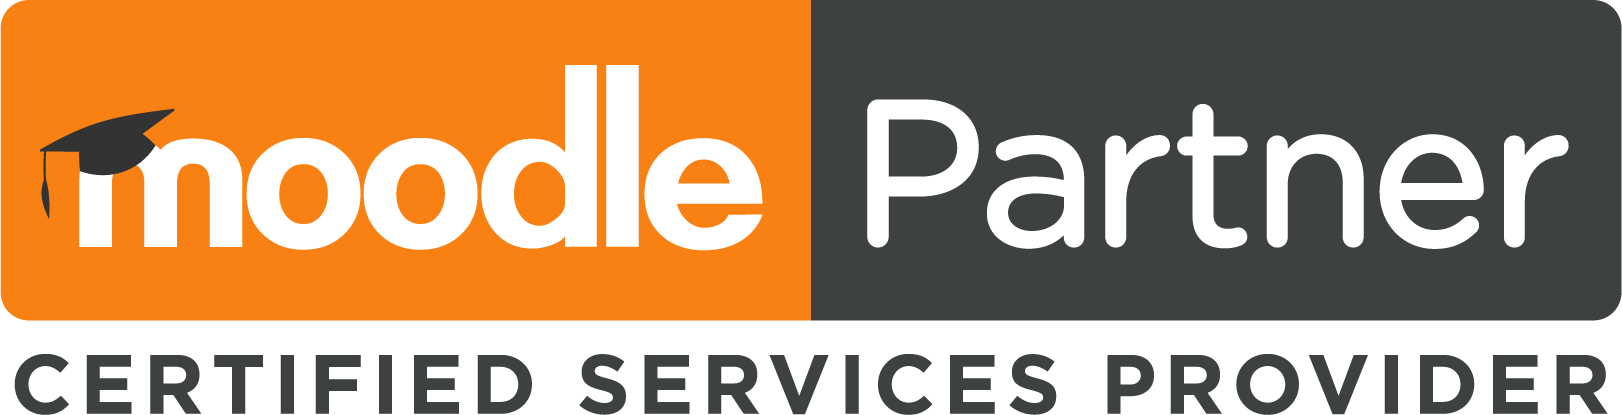 Moodle Partners Logo